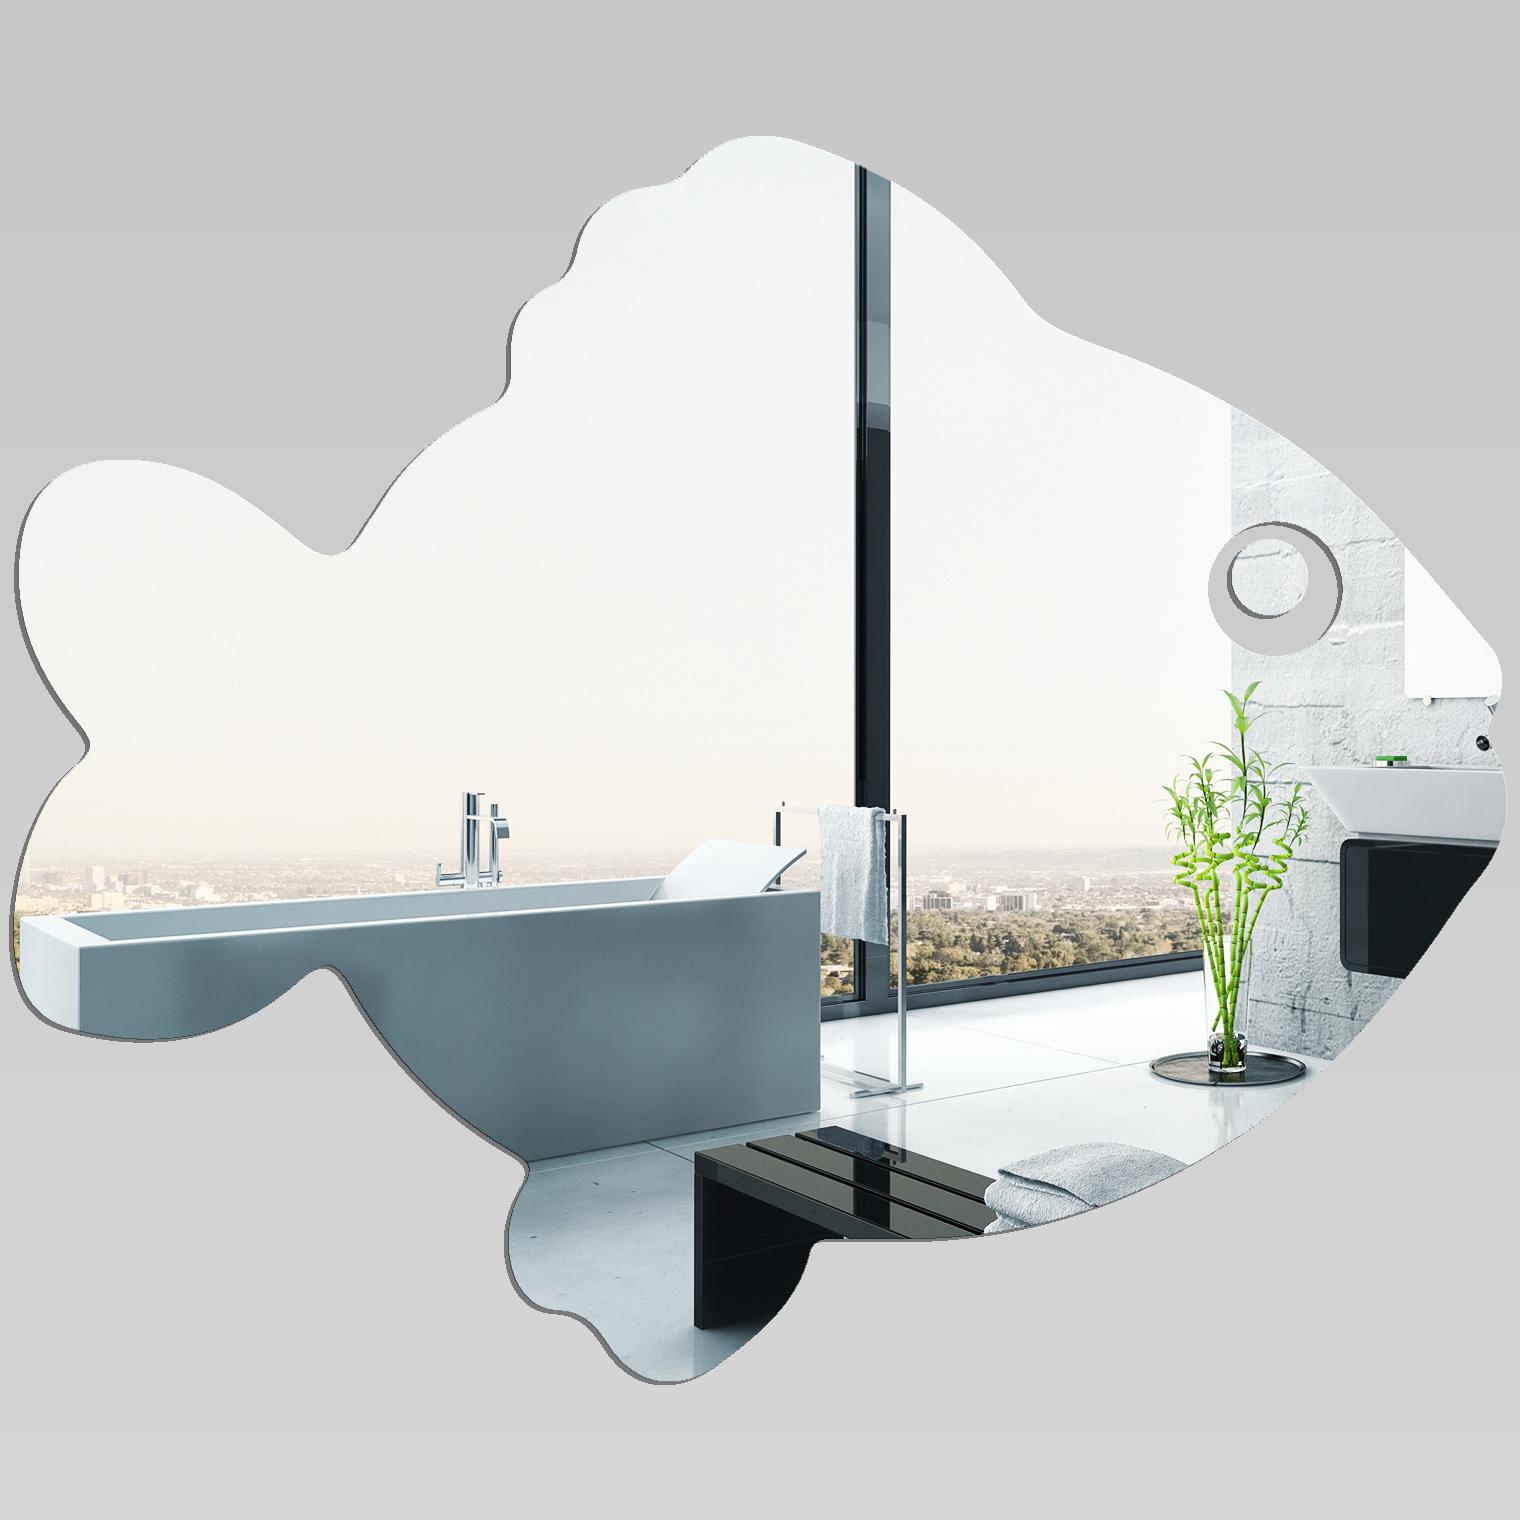 Miroir plexiglass acrylique poisson pas cher for Miroir 50x60